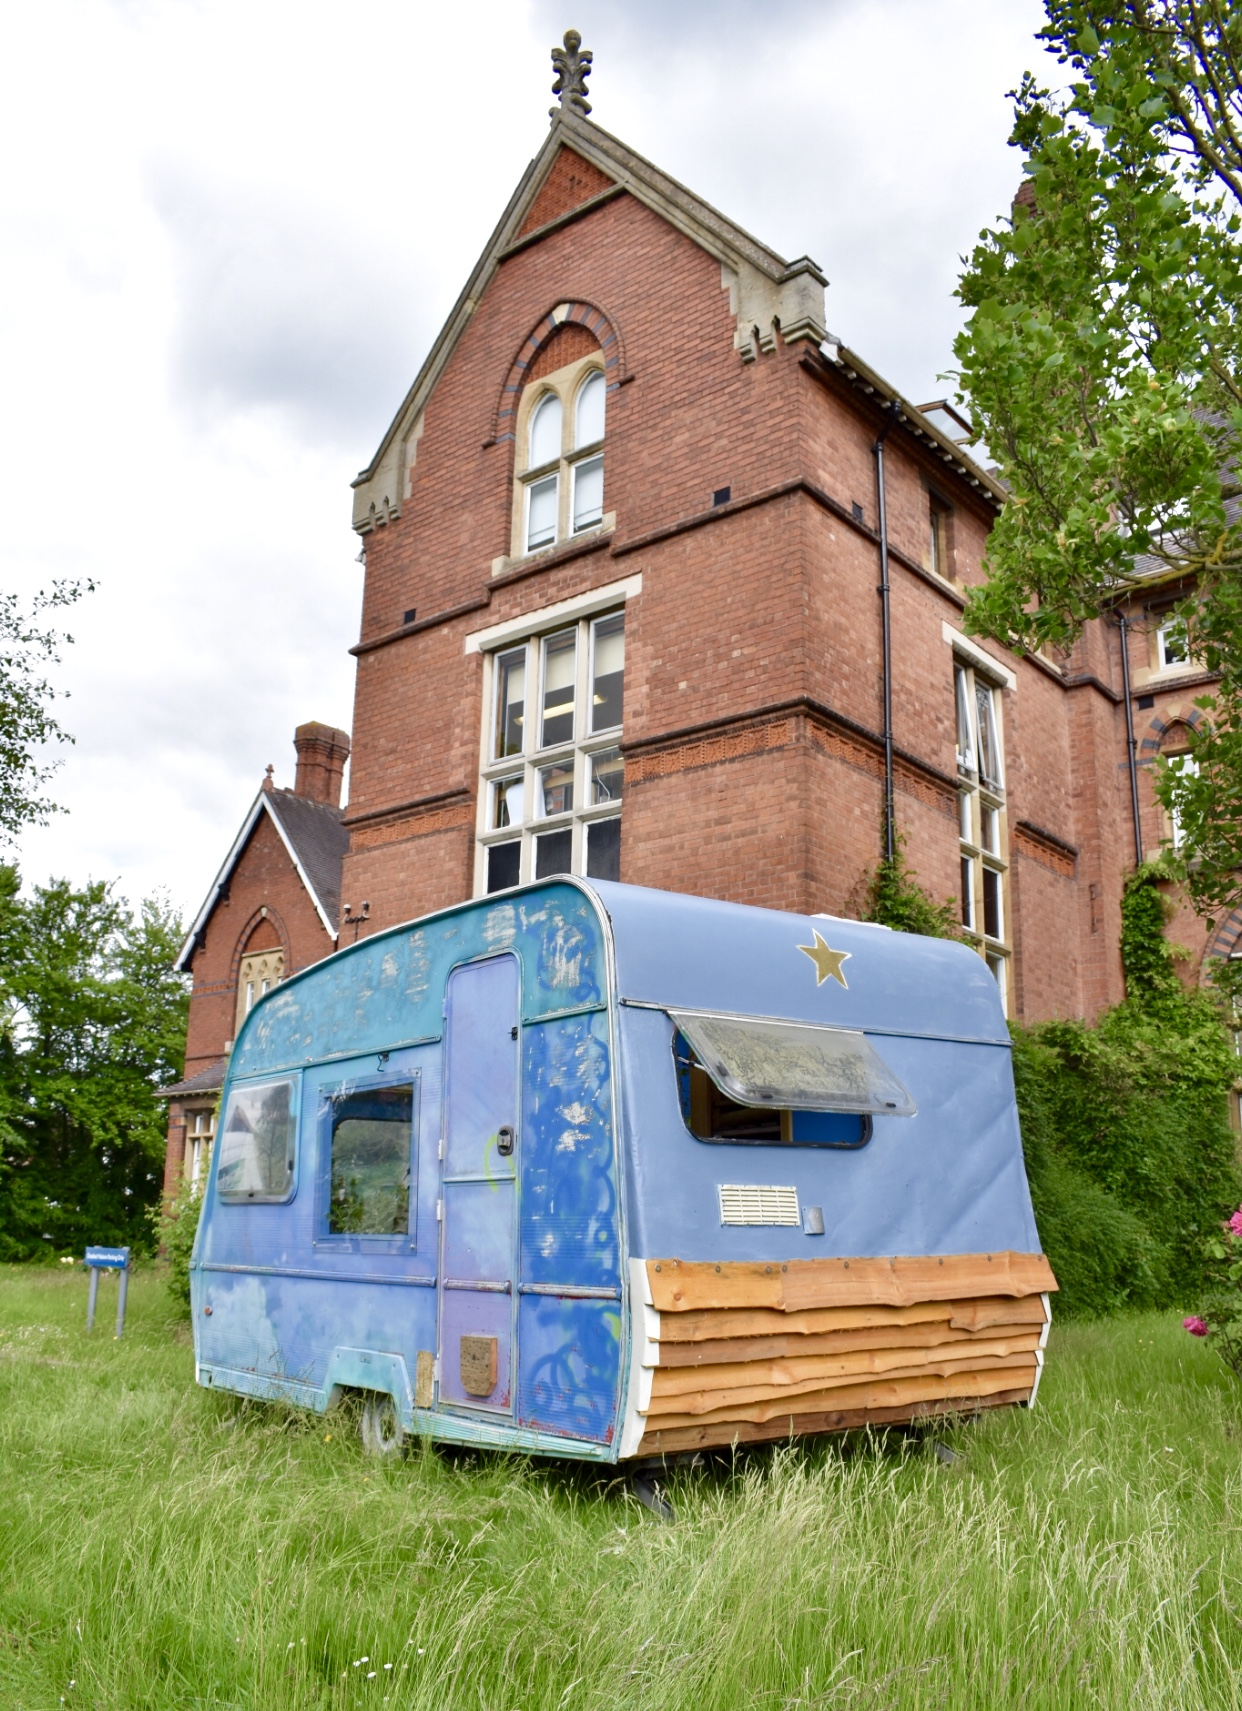 Wanderlust caravan at Hereford College of Arts, May 2019.